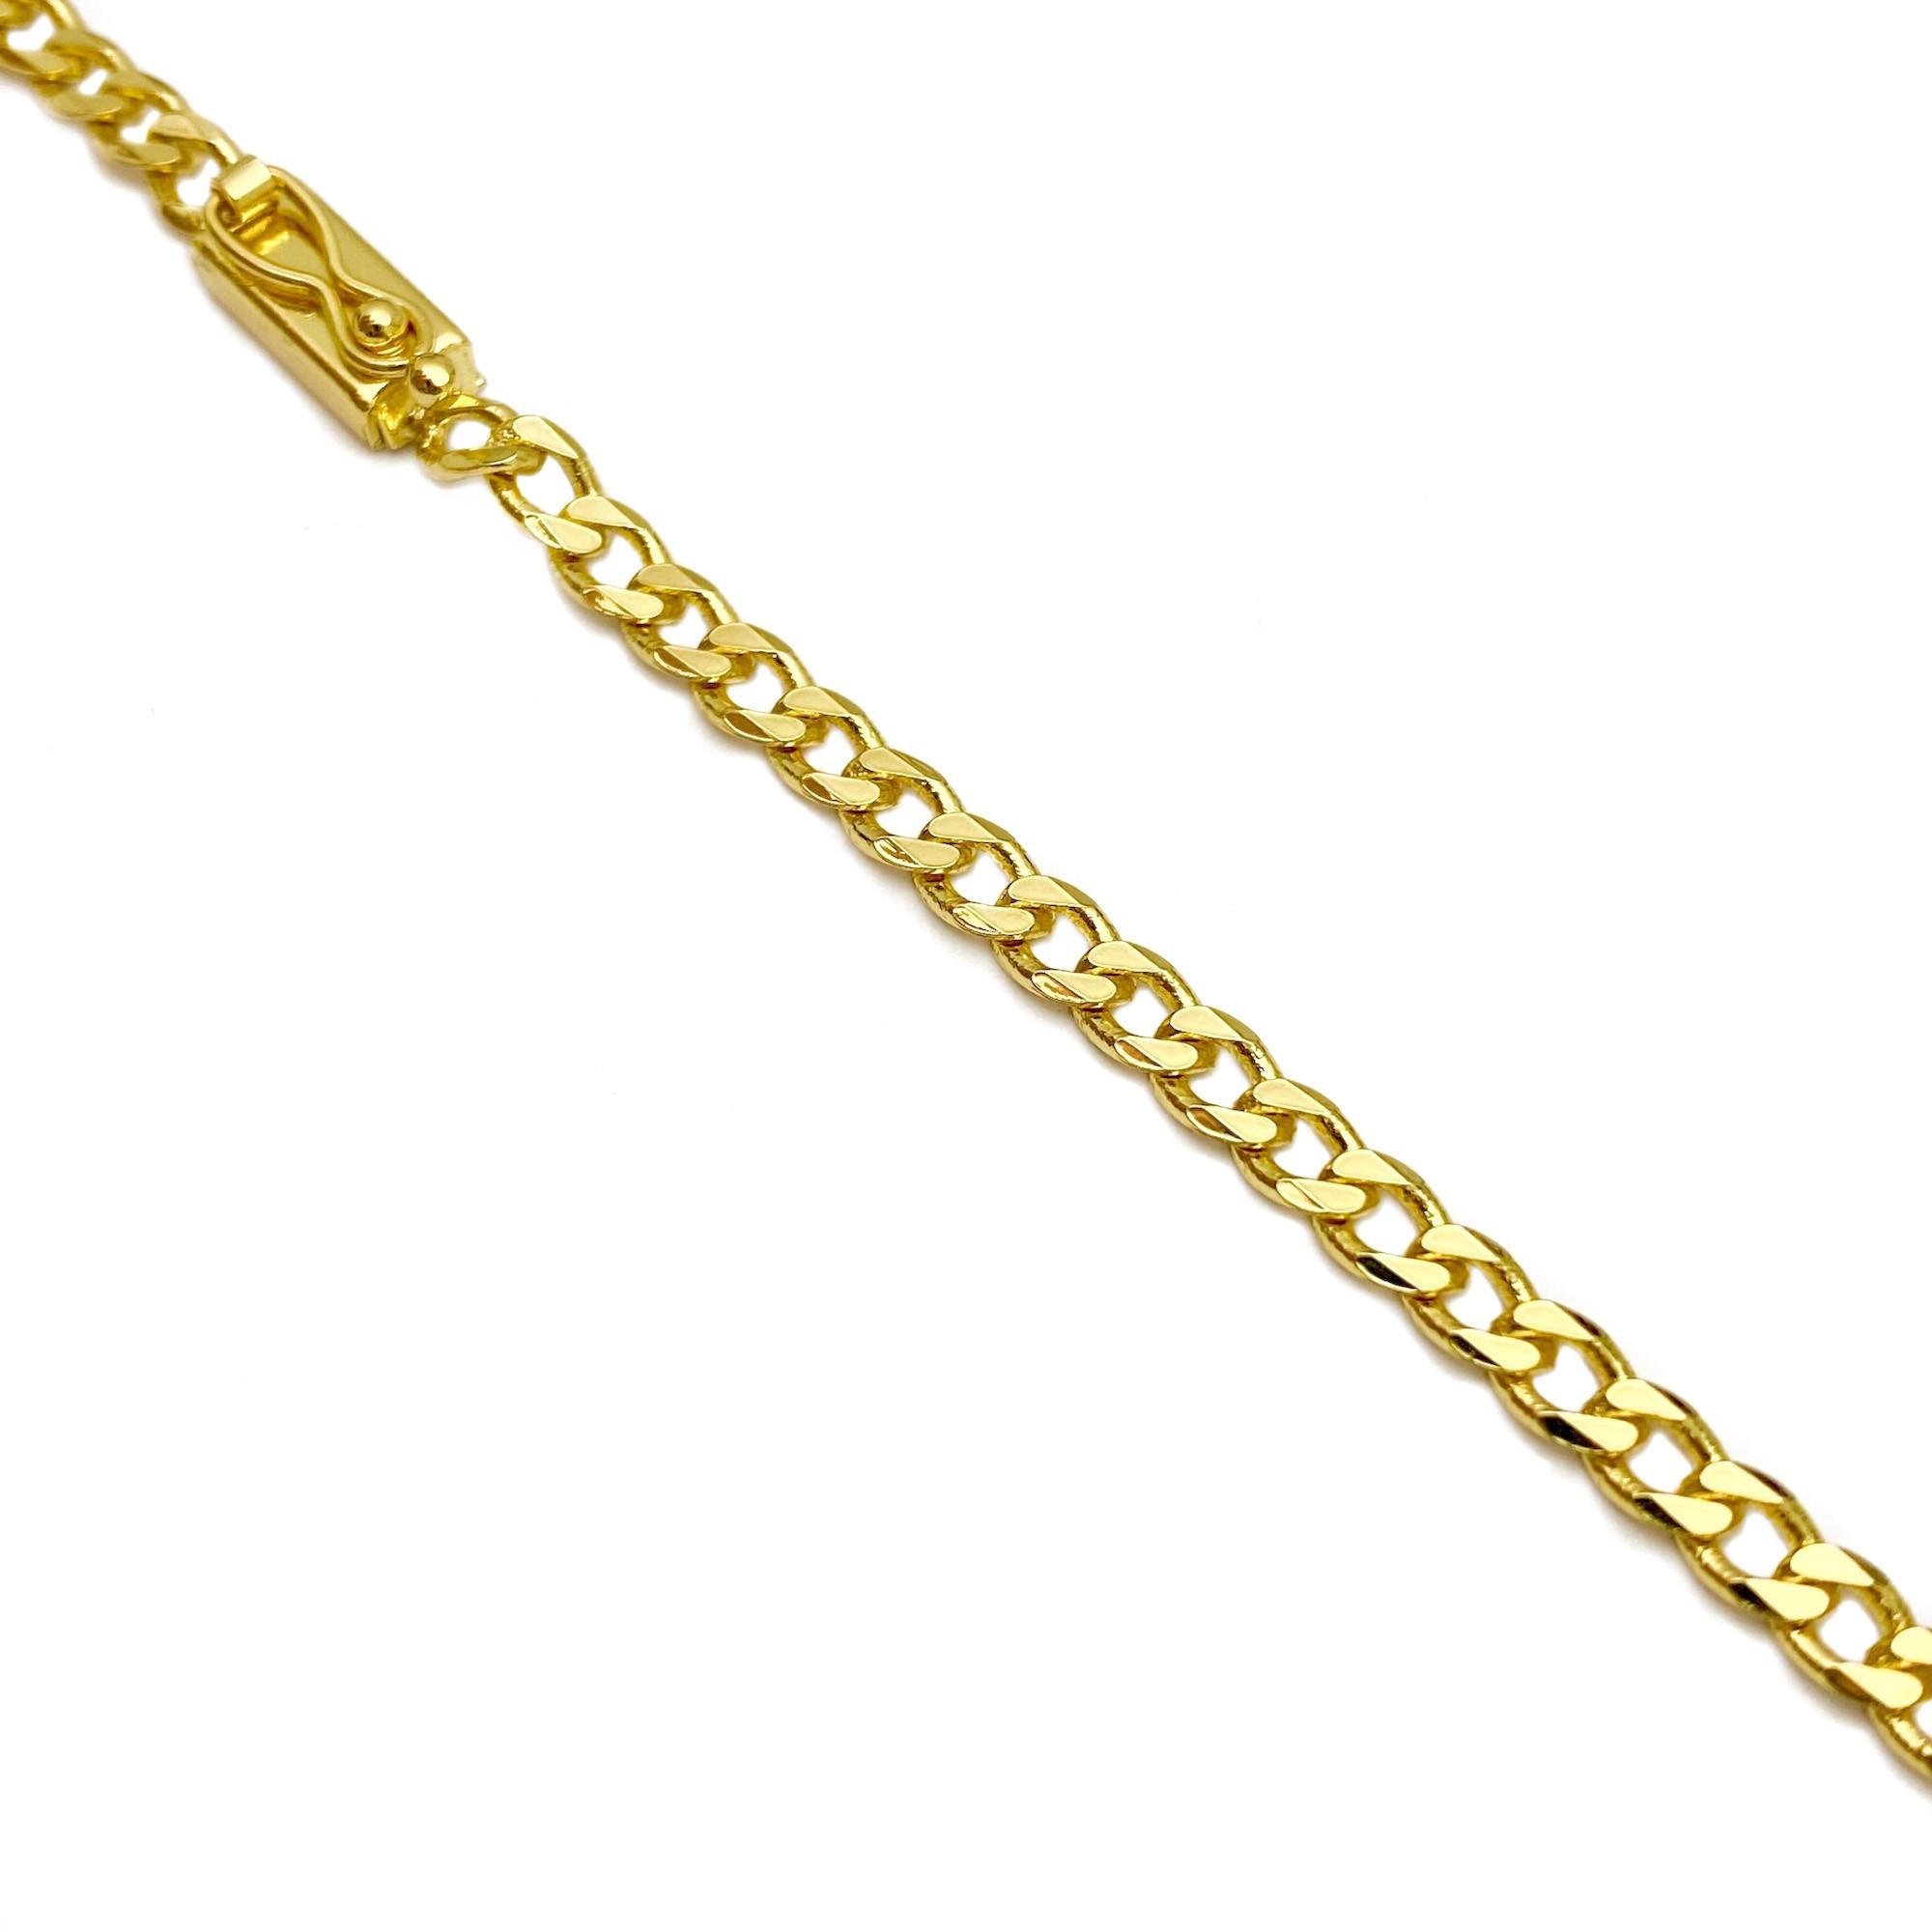 Corrente Grumet 4mm 70cm 16g (Fecho Gaveta) (Banho Ouro 24k)